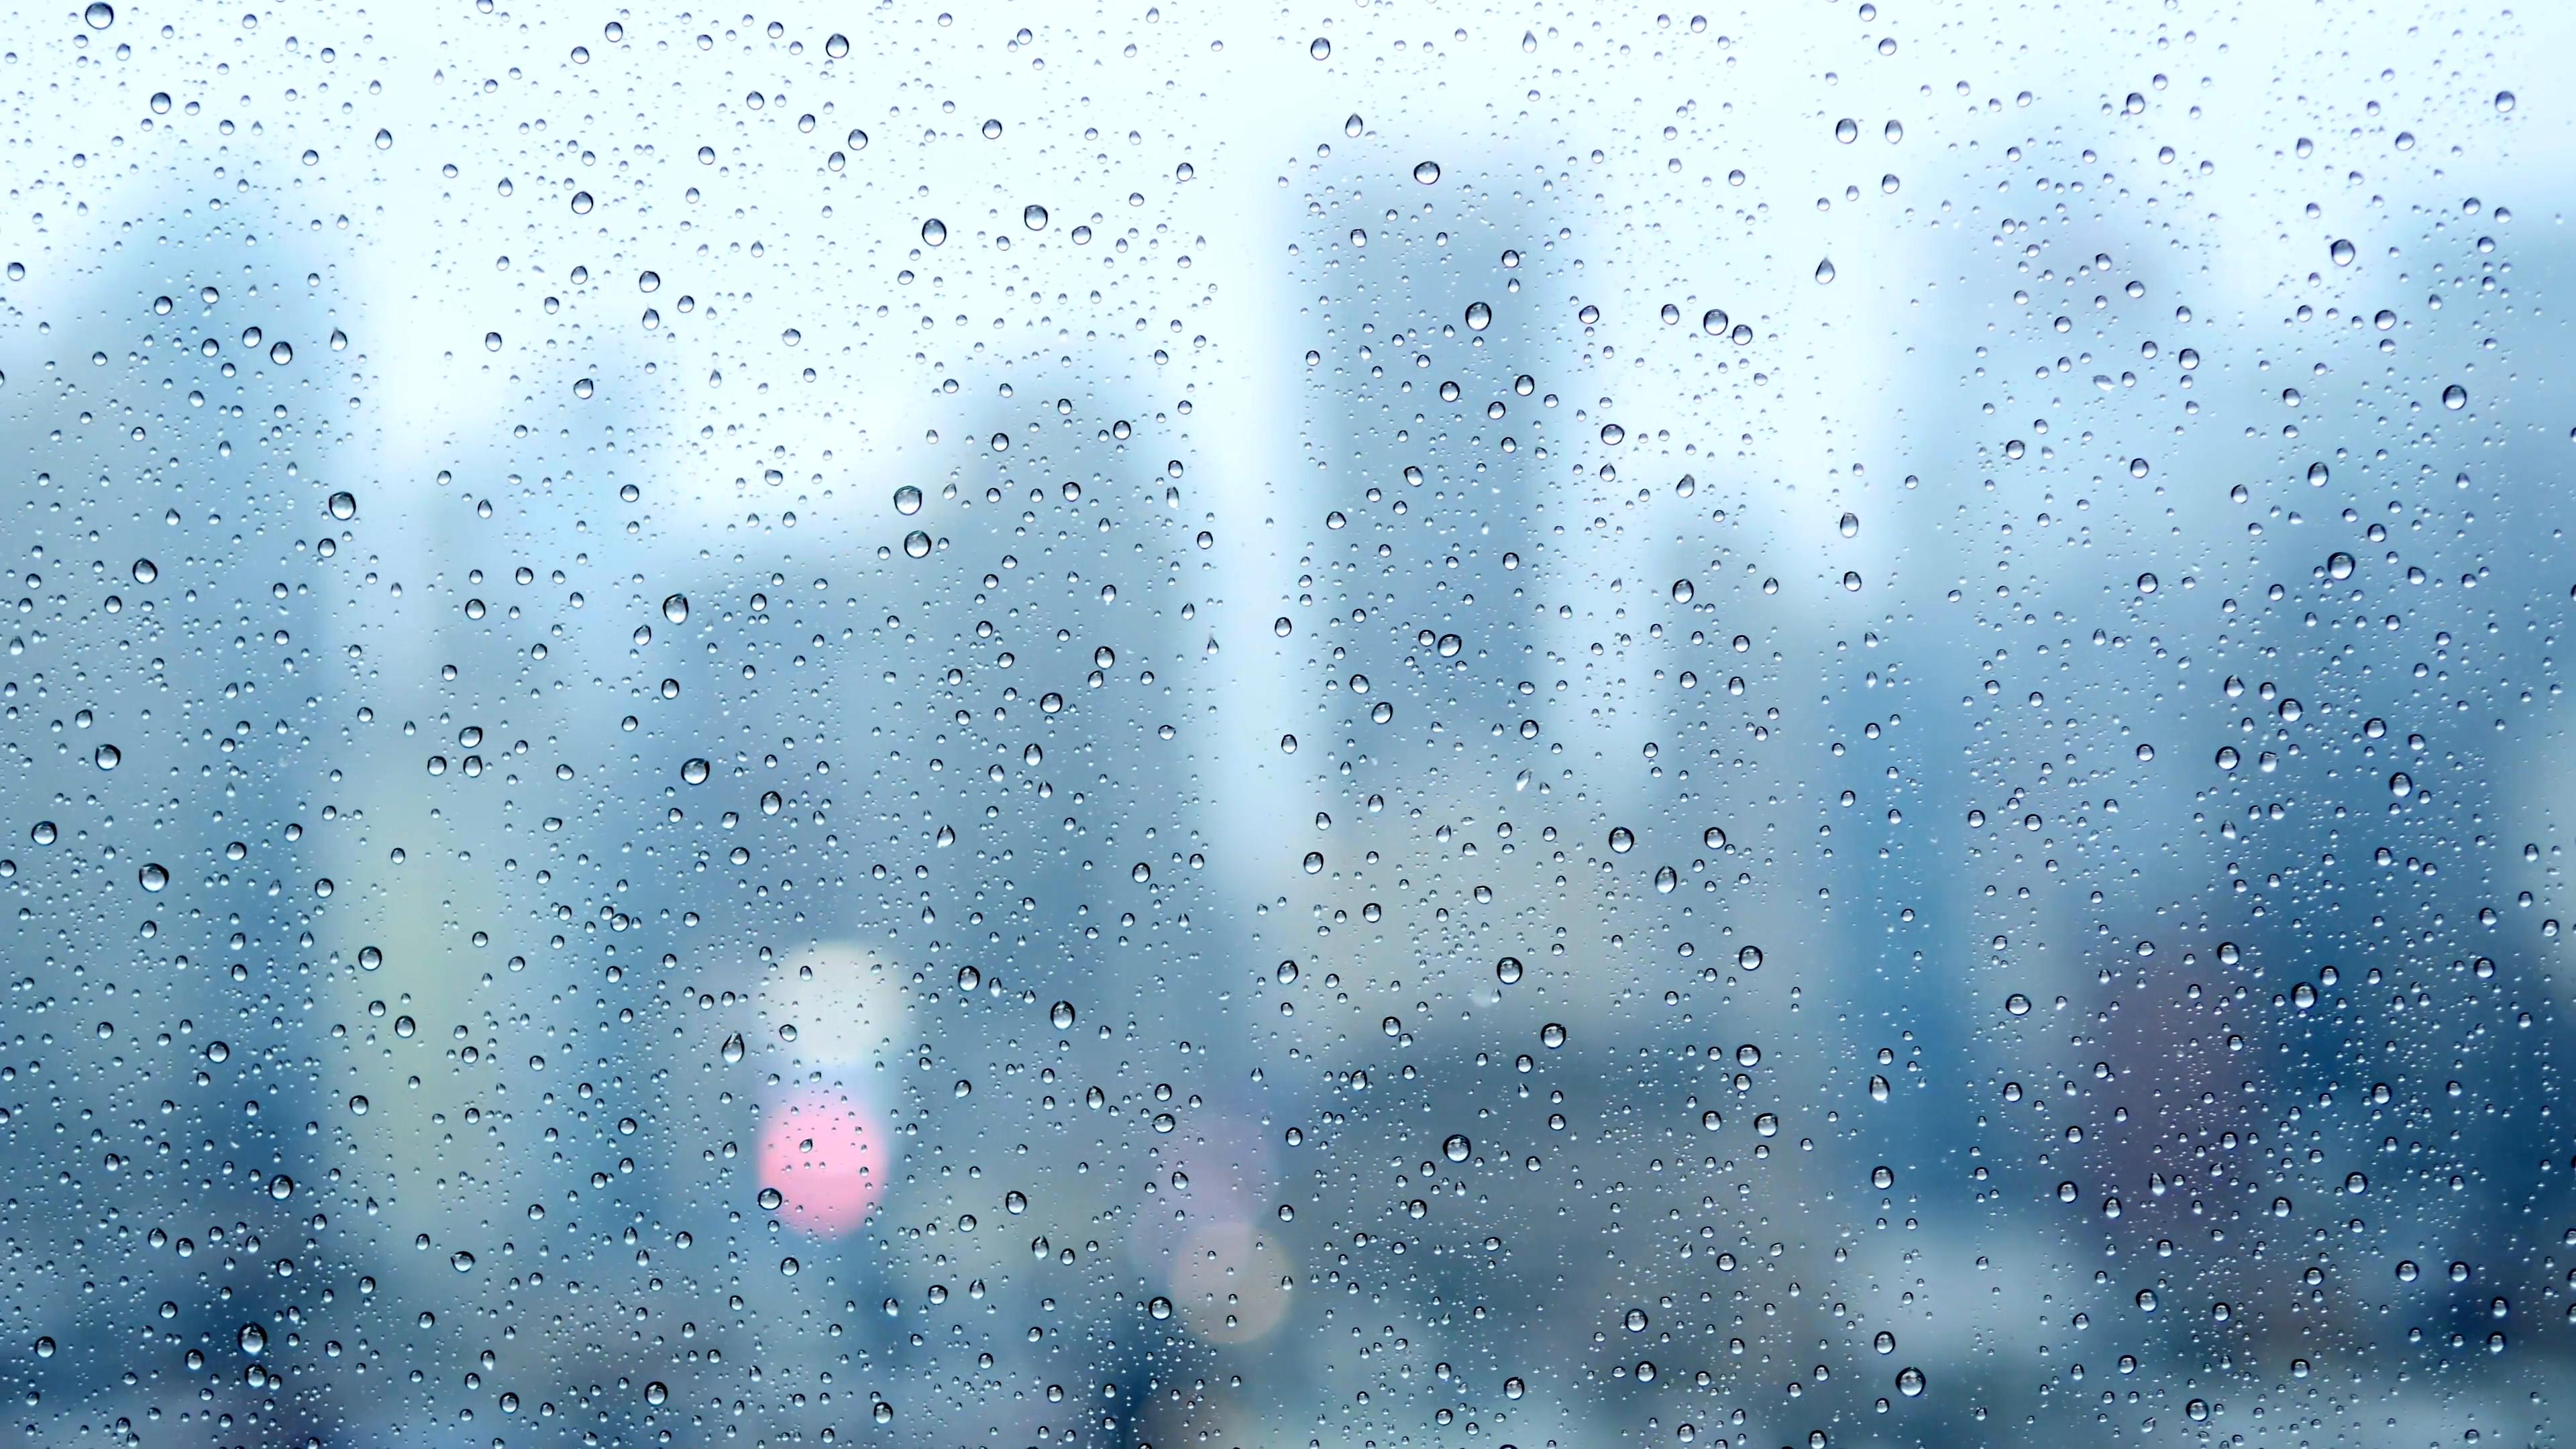 moddy wet weather background. raining city scenery. sad rain drops.